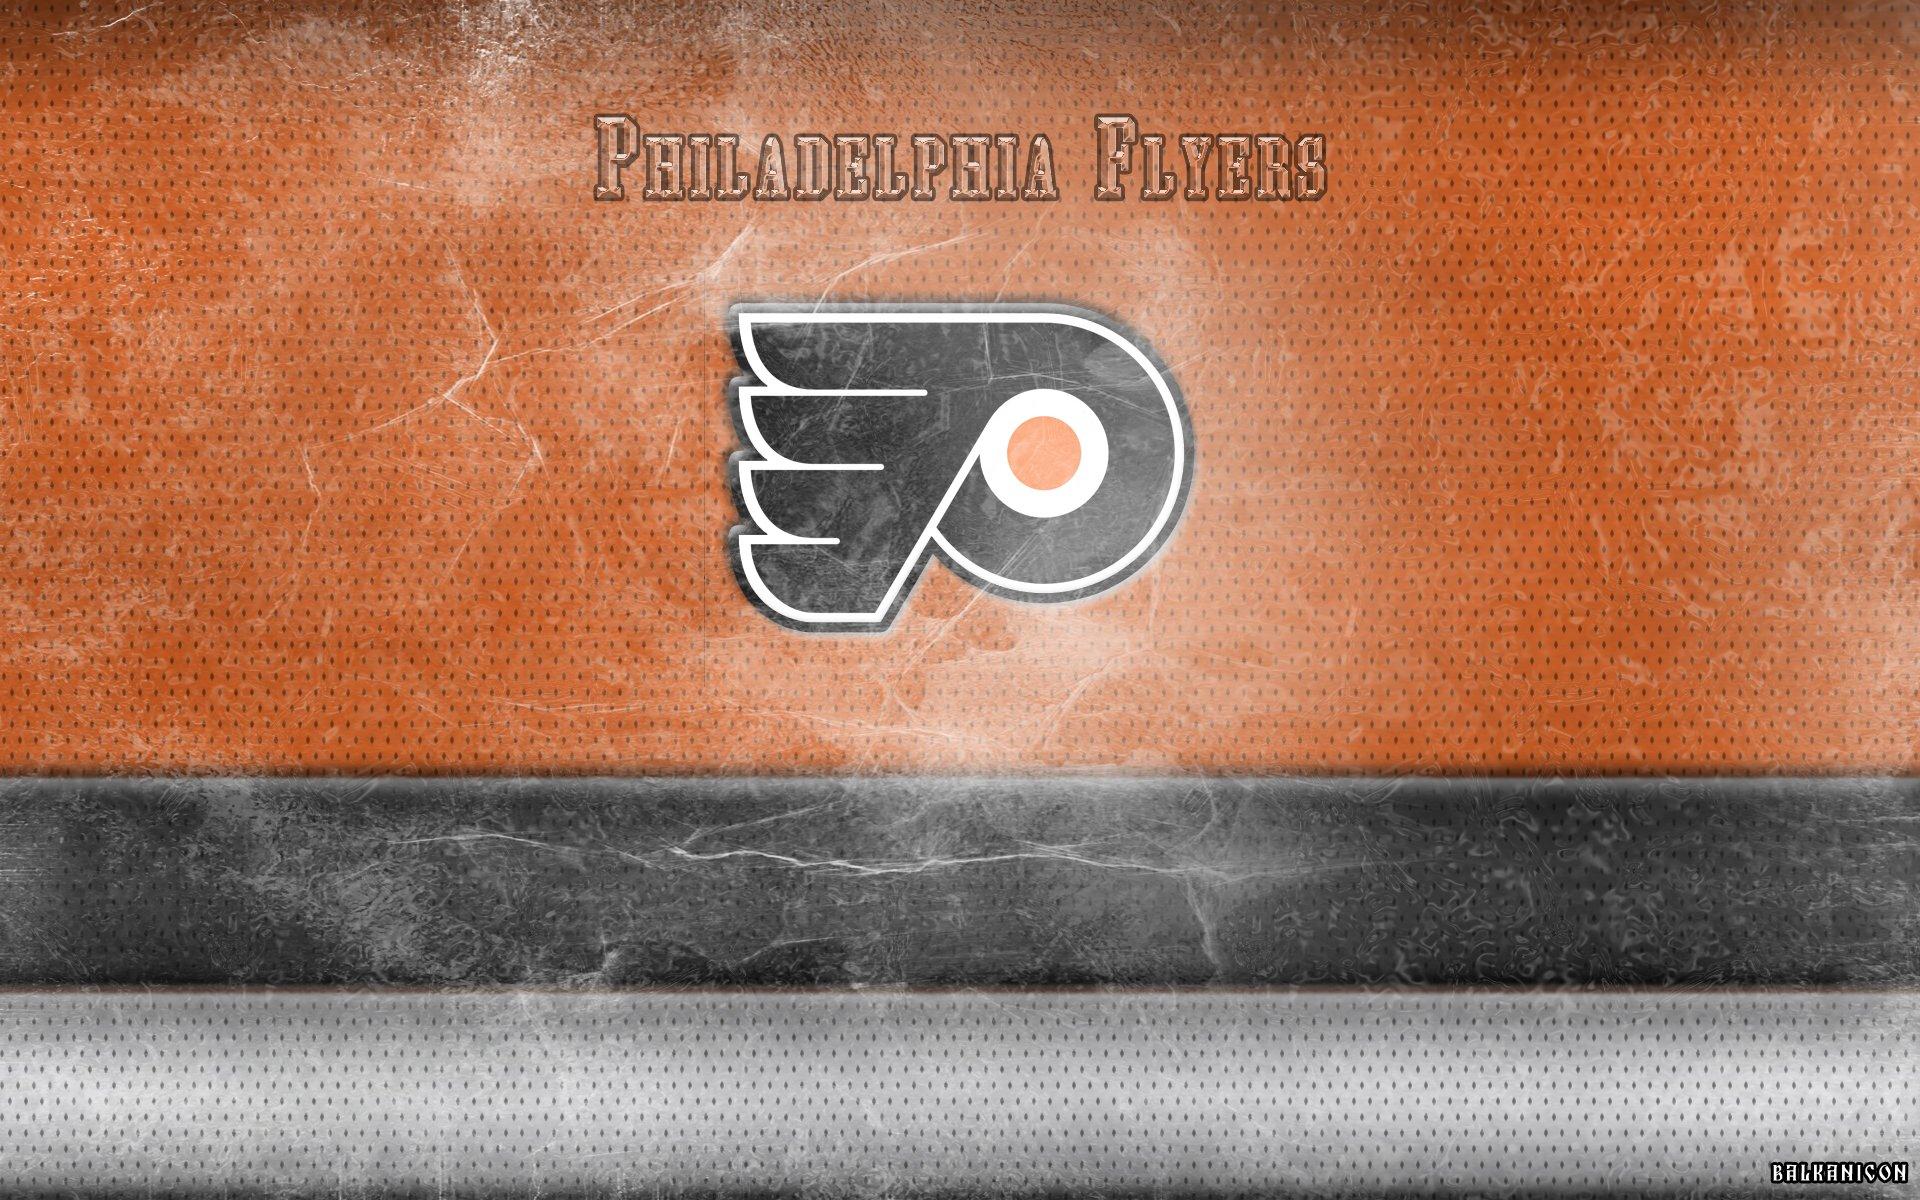 PHILADELPHIA FLYERS nhl hockey 16 wallpaper background 1920x1200